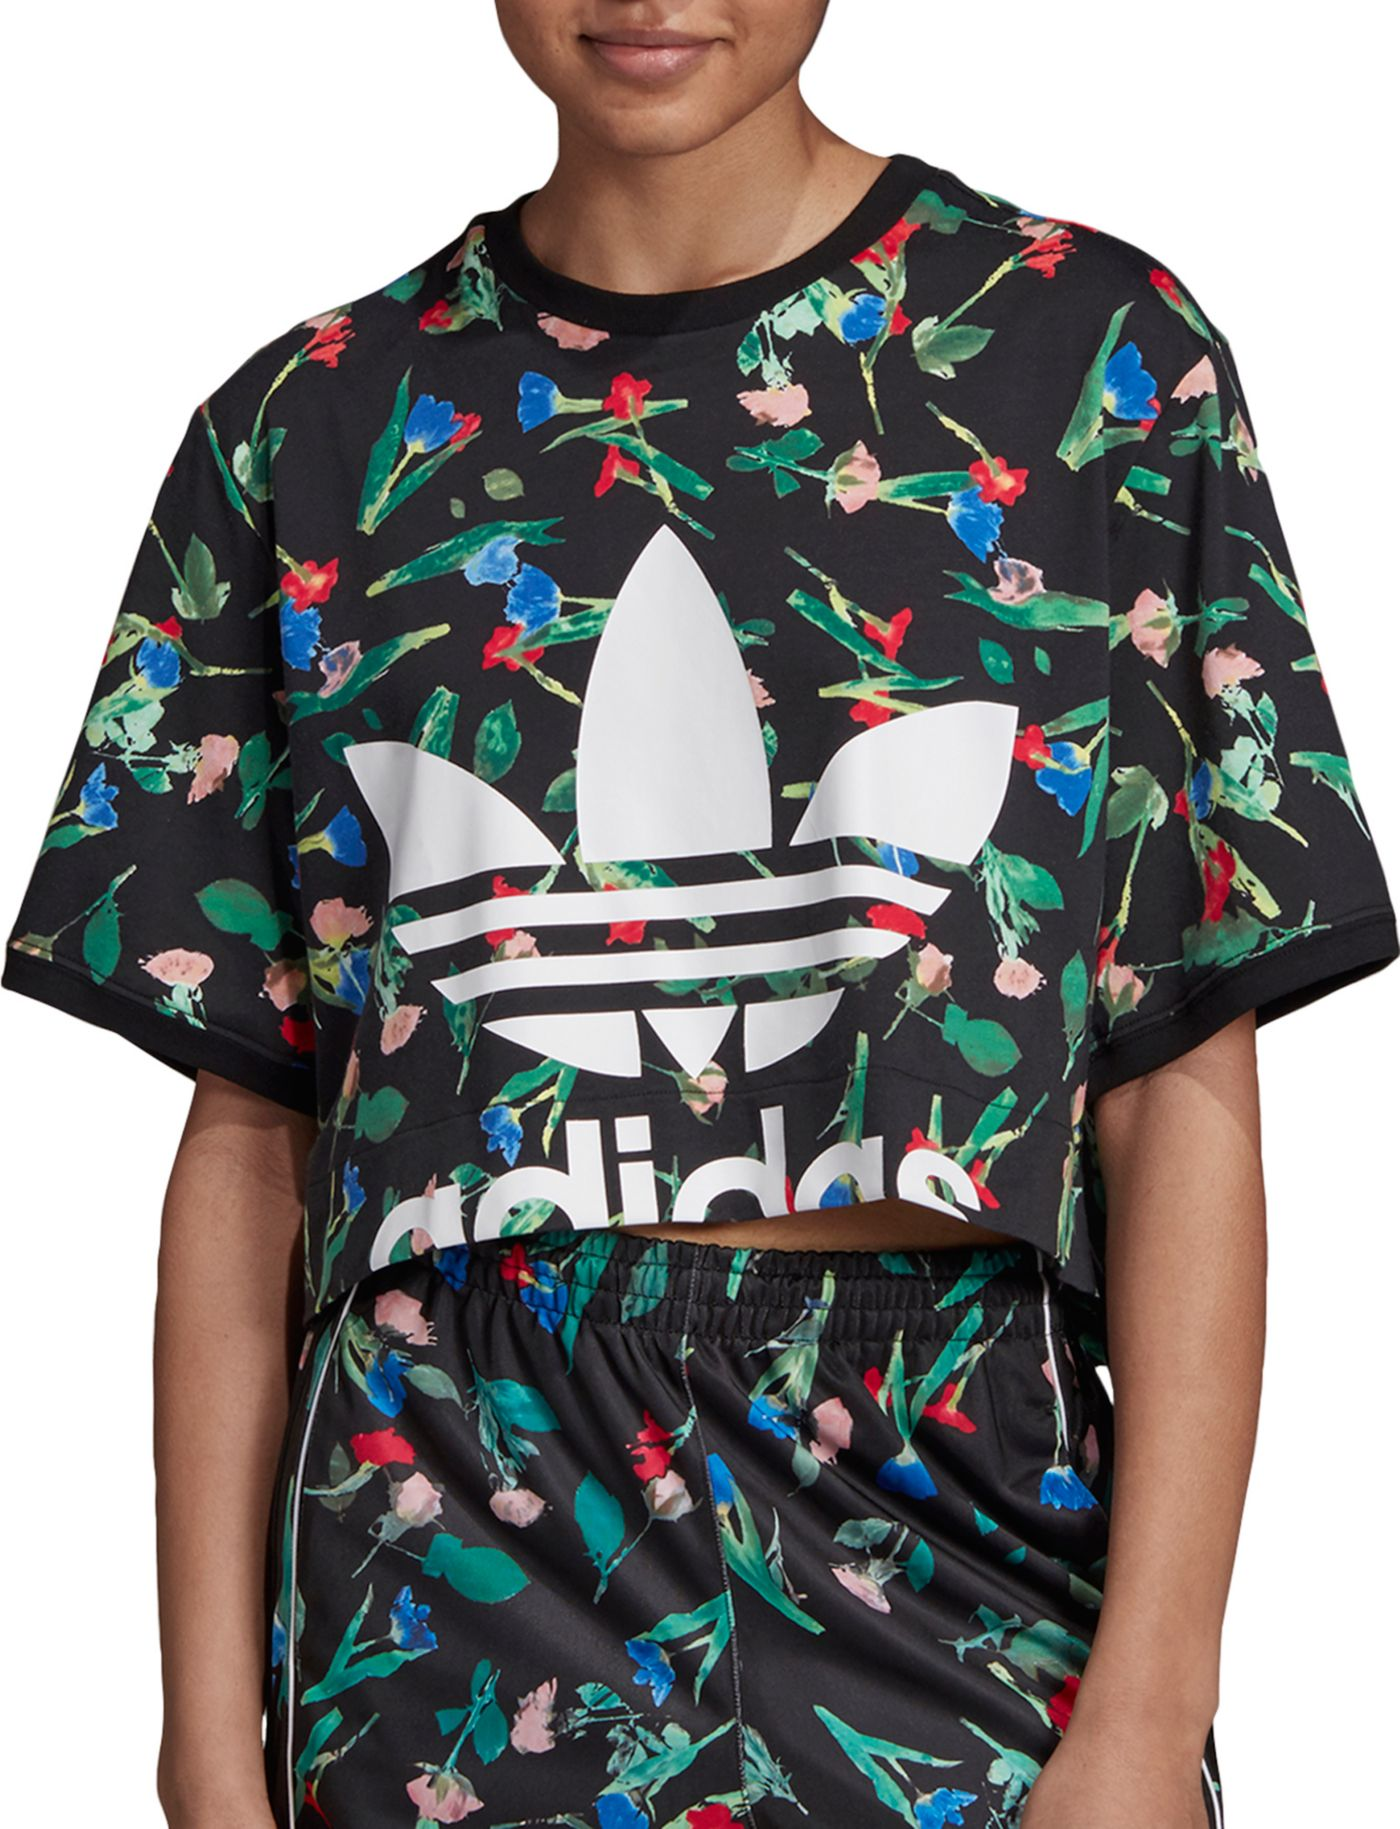 adidas Originals Women's Bellista Crop T-Shirt